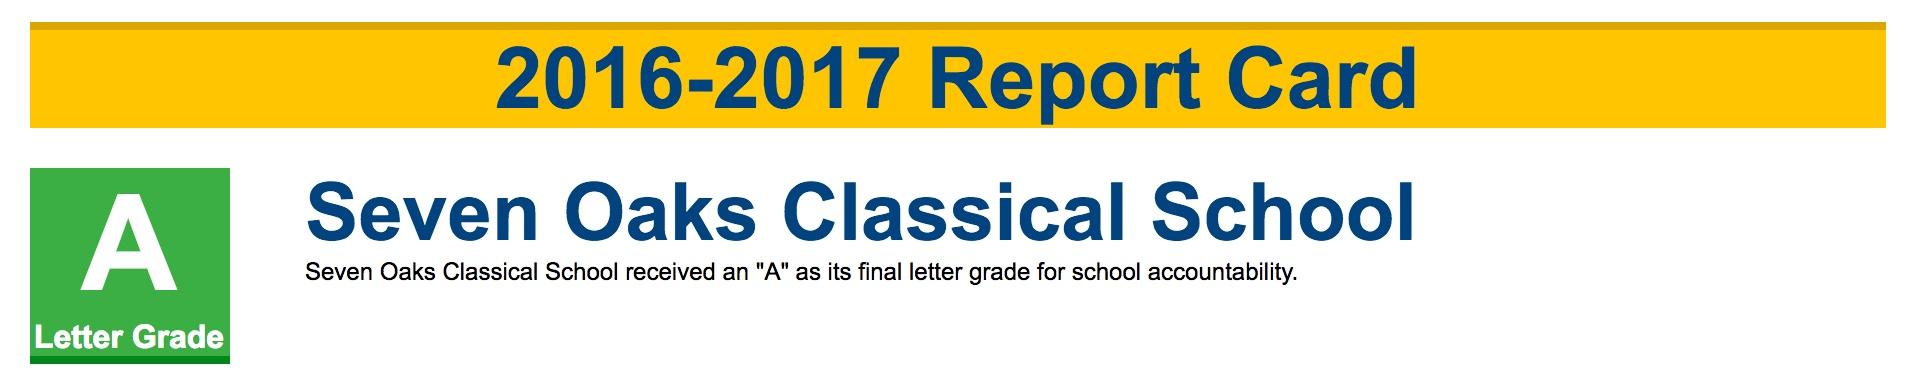 school-report-card.jpeg